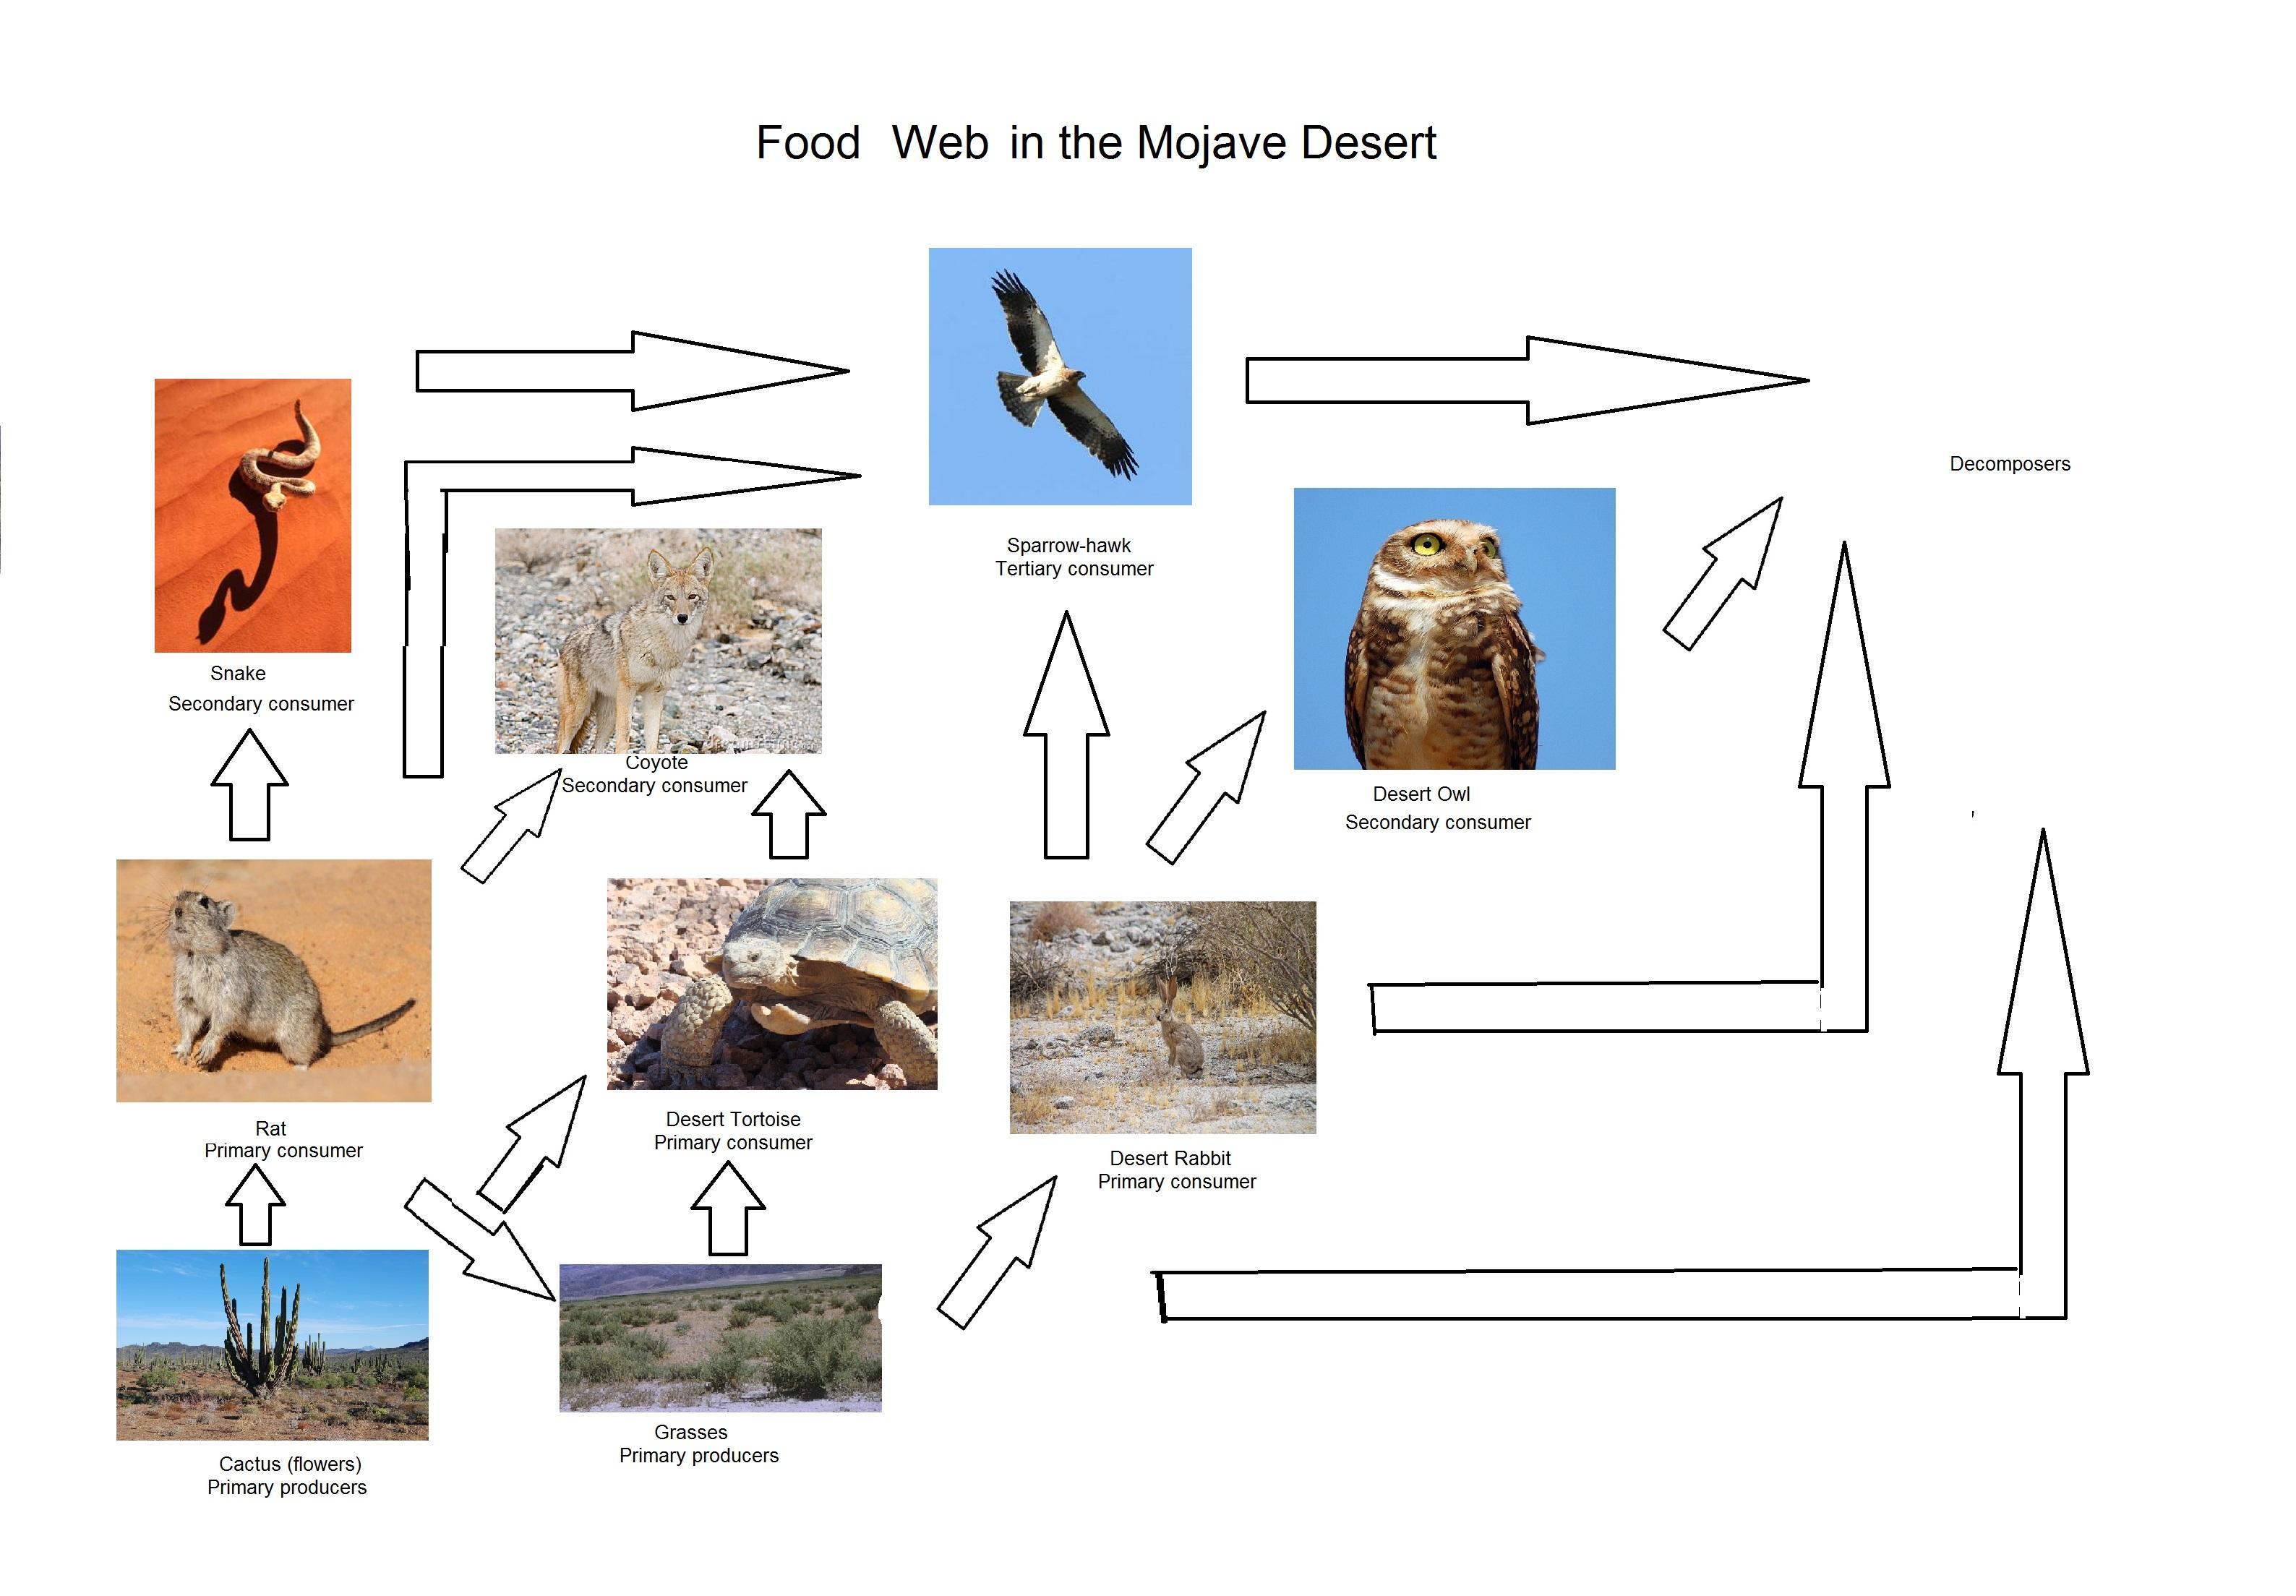 Food Web Of The Mojave Desert